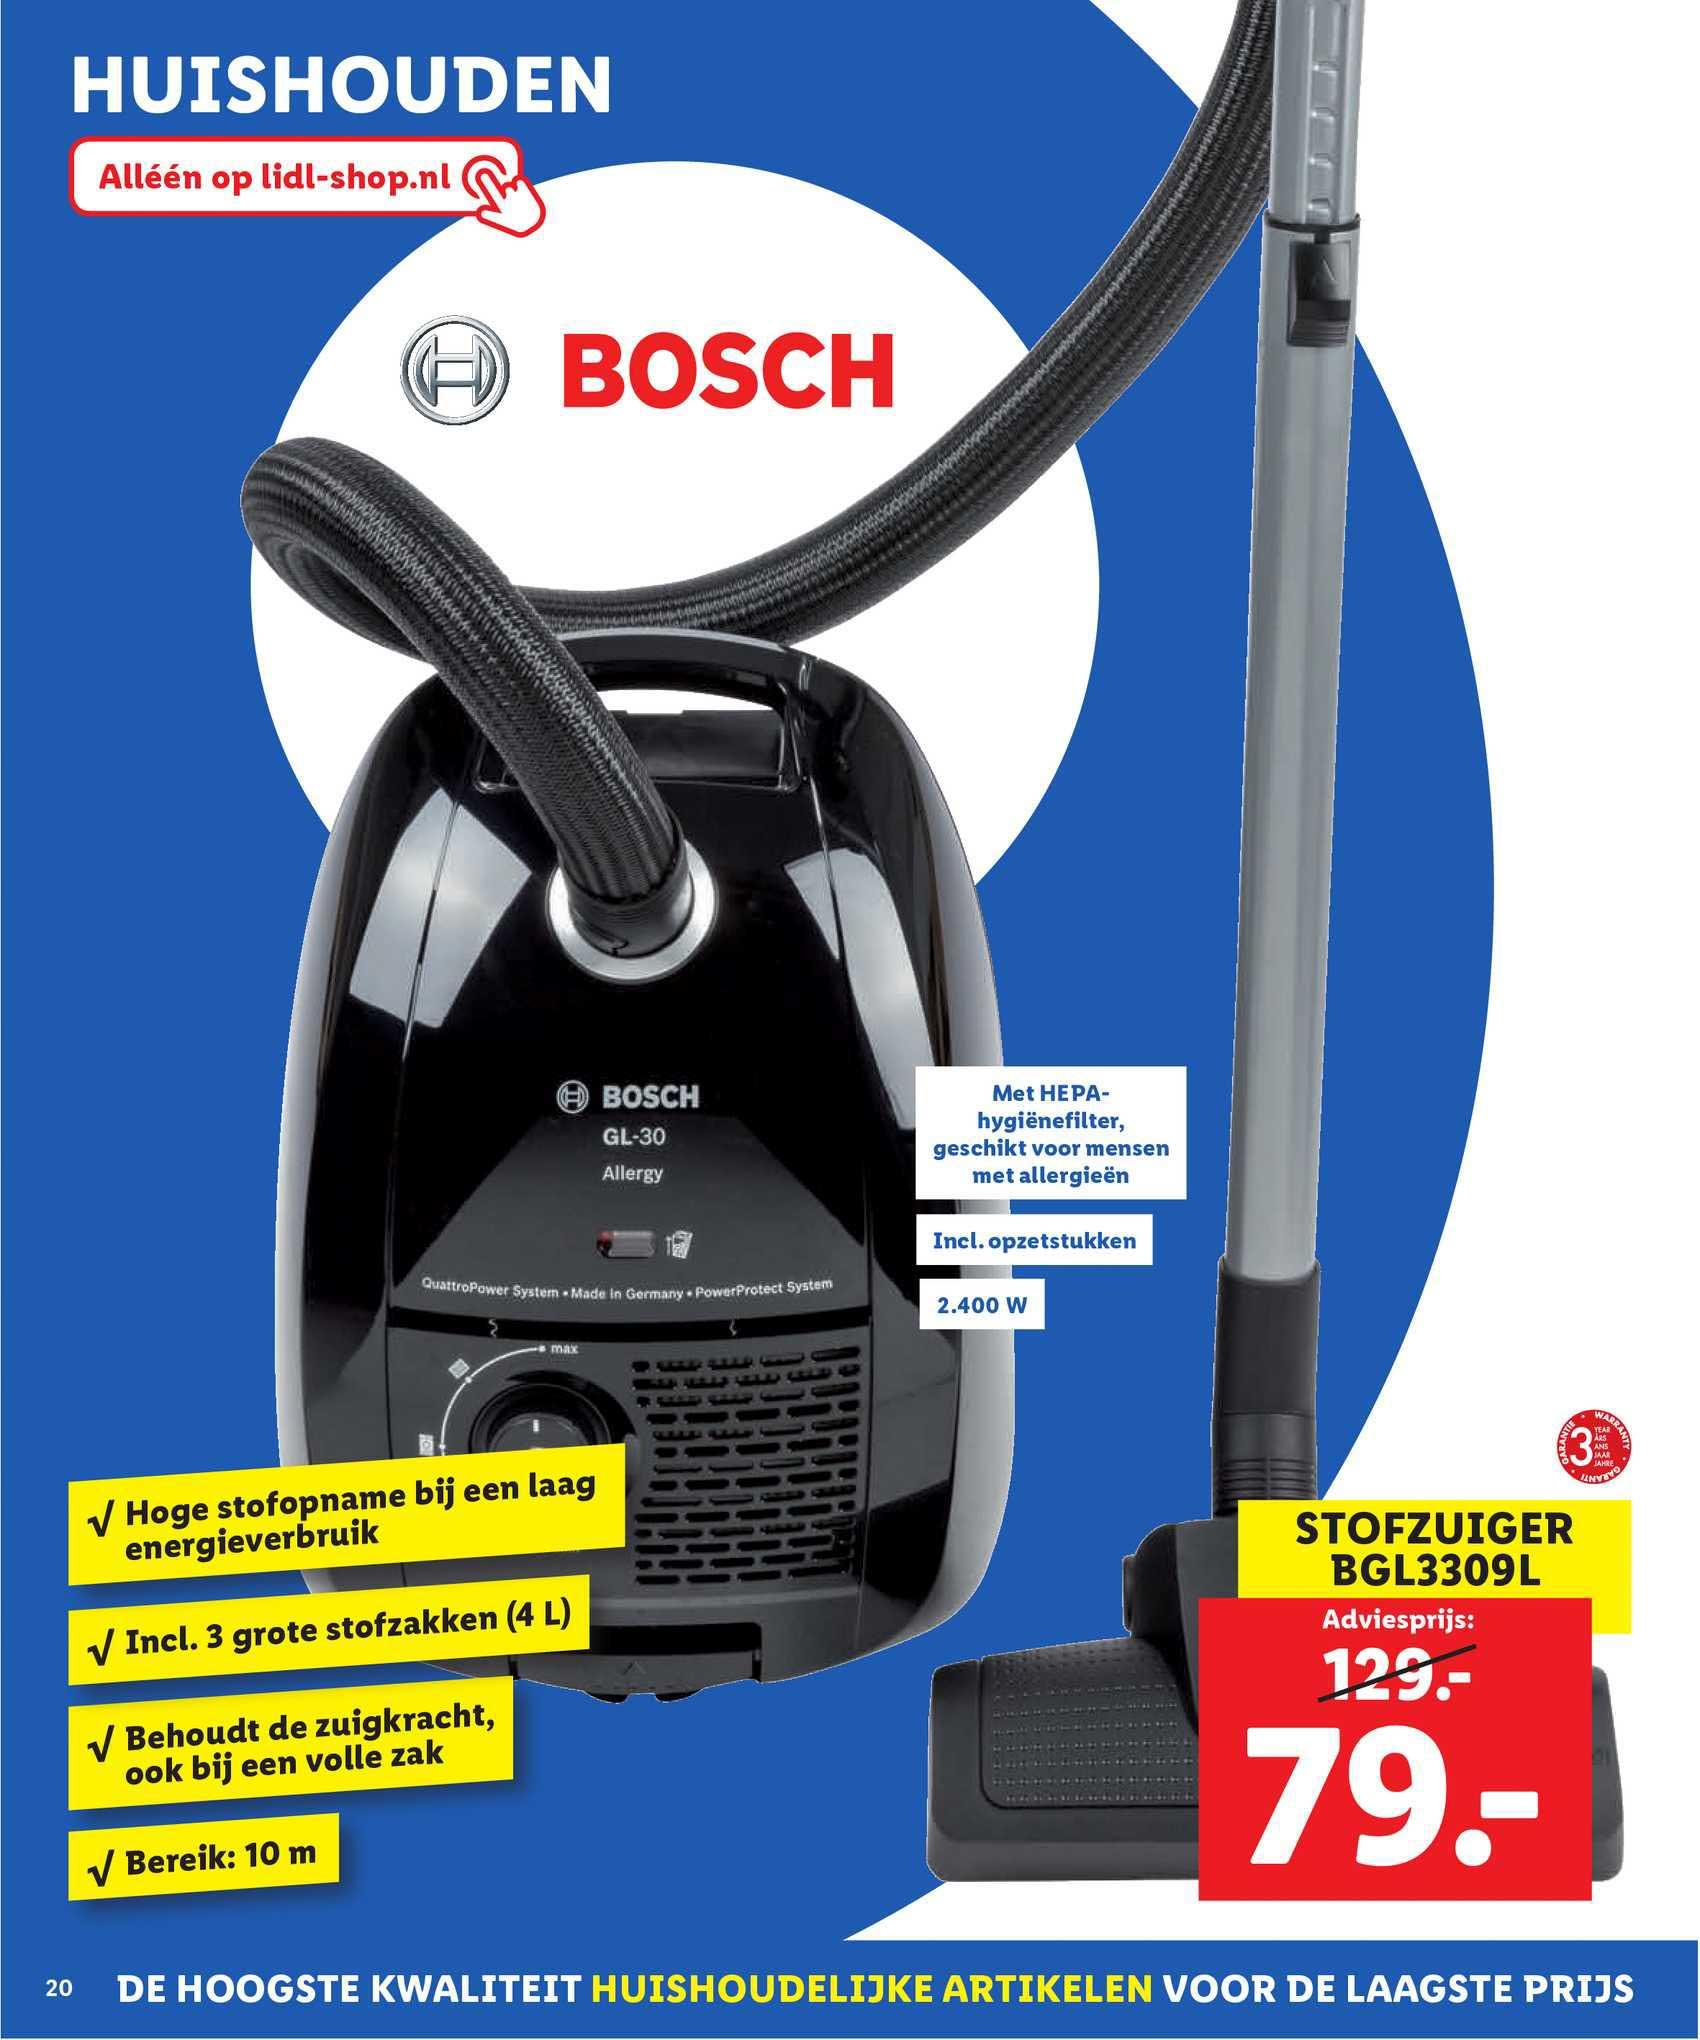 Lidl Shop Bosch Stofzuiger BGL3309L